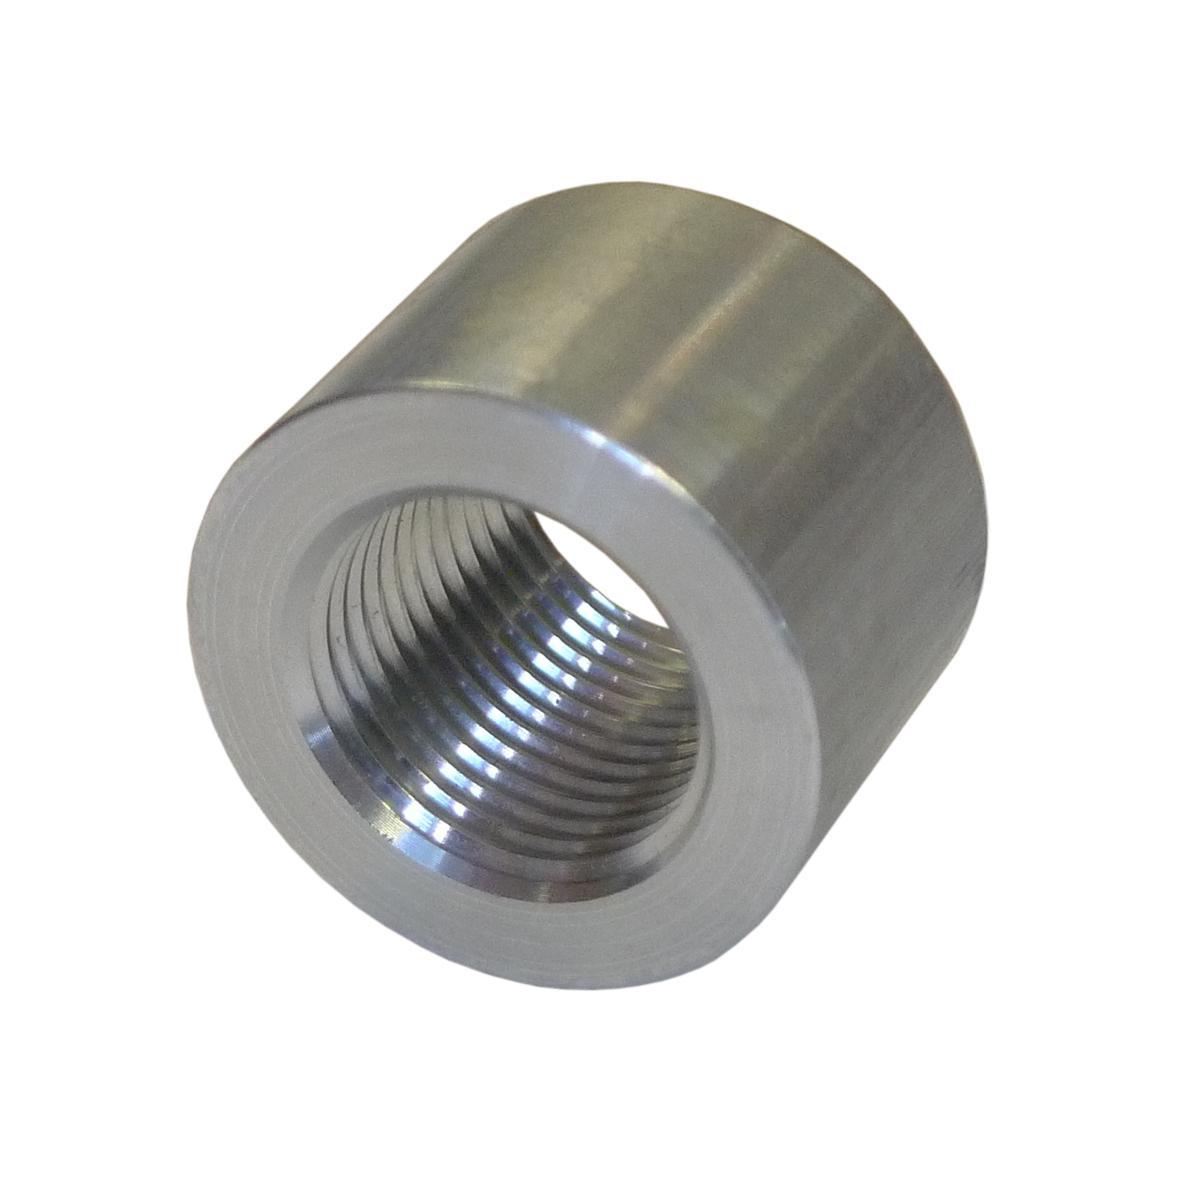 Npt round female boss weld on fitting alloy fabrication